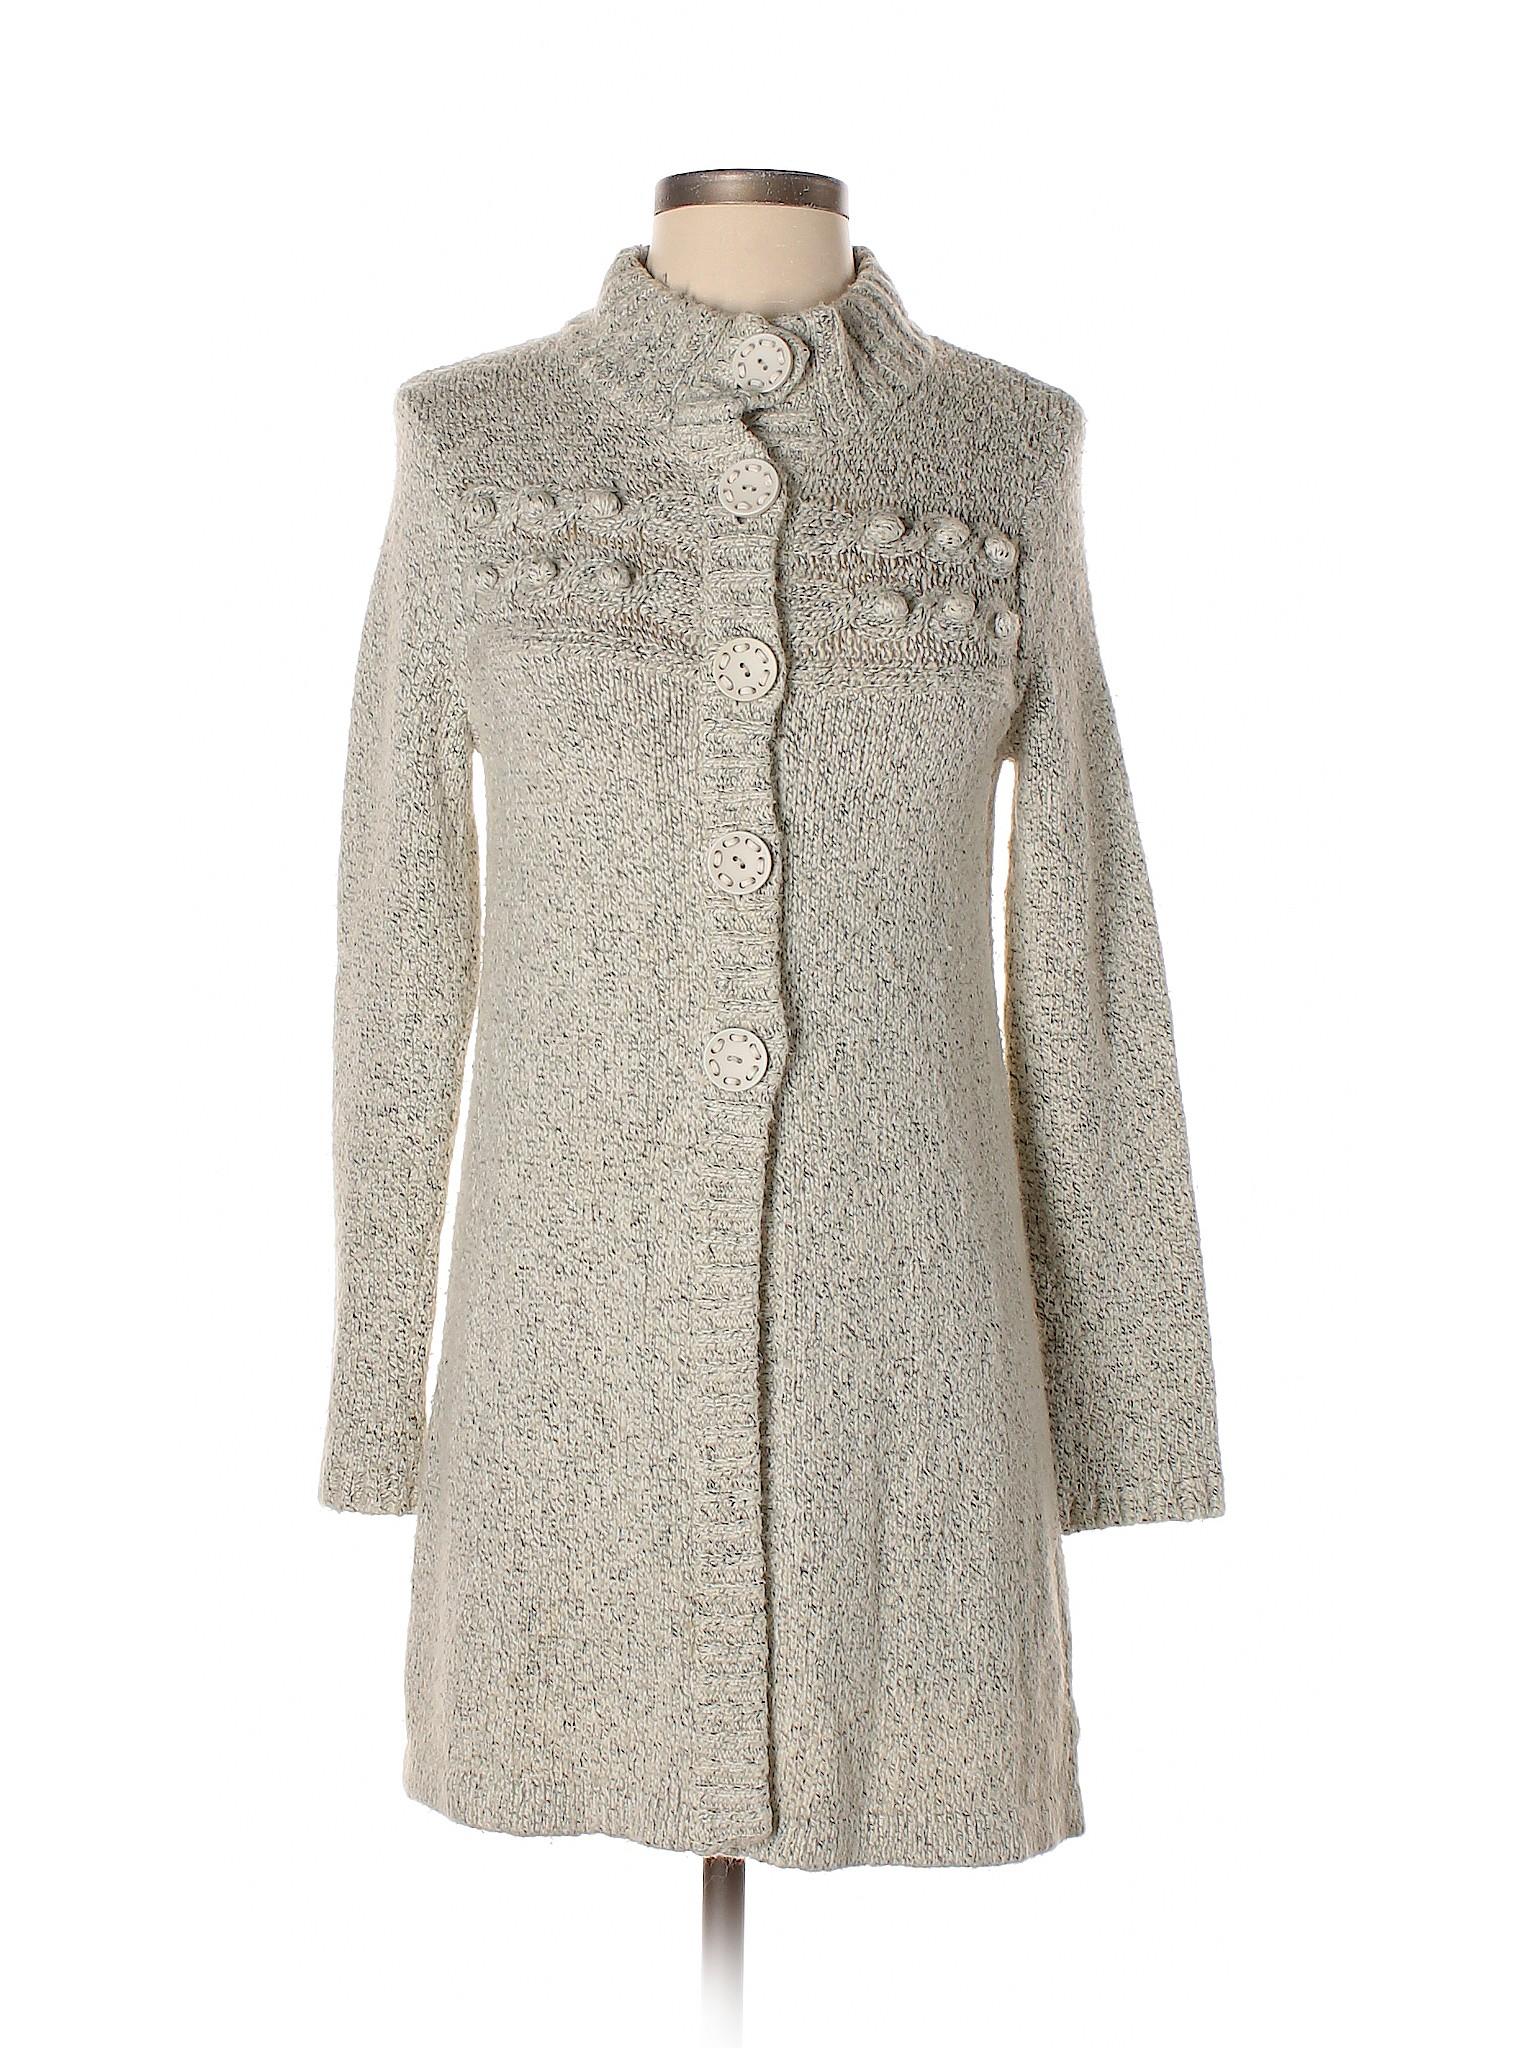 Boutique Boutique winter Style amp;Co Boutique Style Cardigan Style winter Cardigan amp;Co amp;Co winter 8fq1Bqnw5C